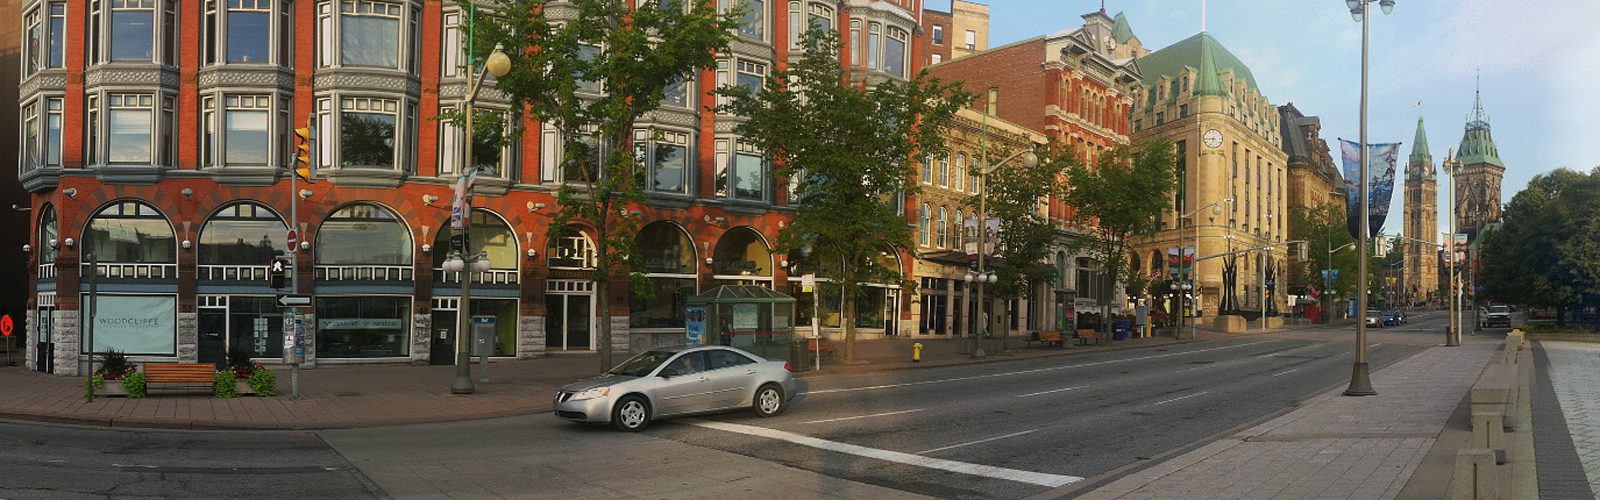 Ottawa - Elgin Street at the War Memorial (Mark Ruthenberg)